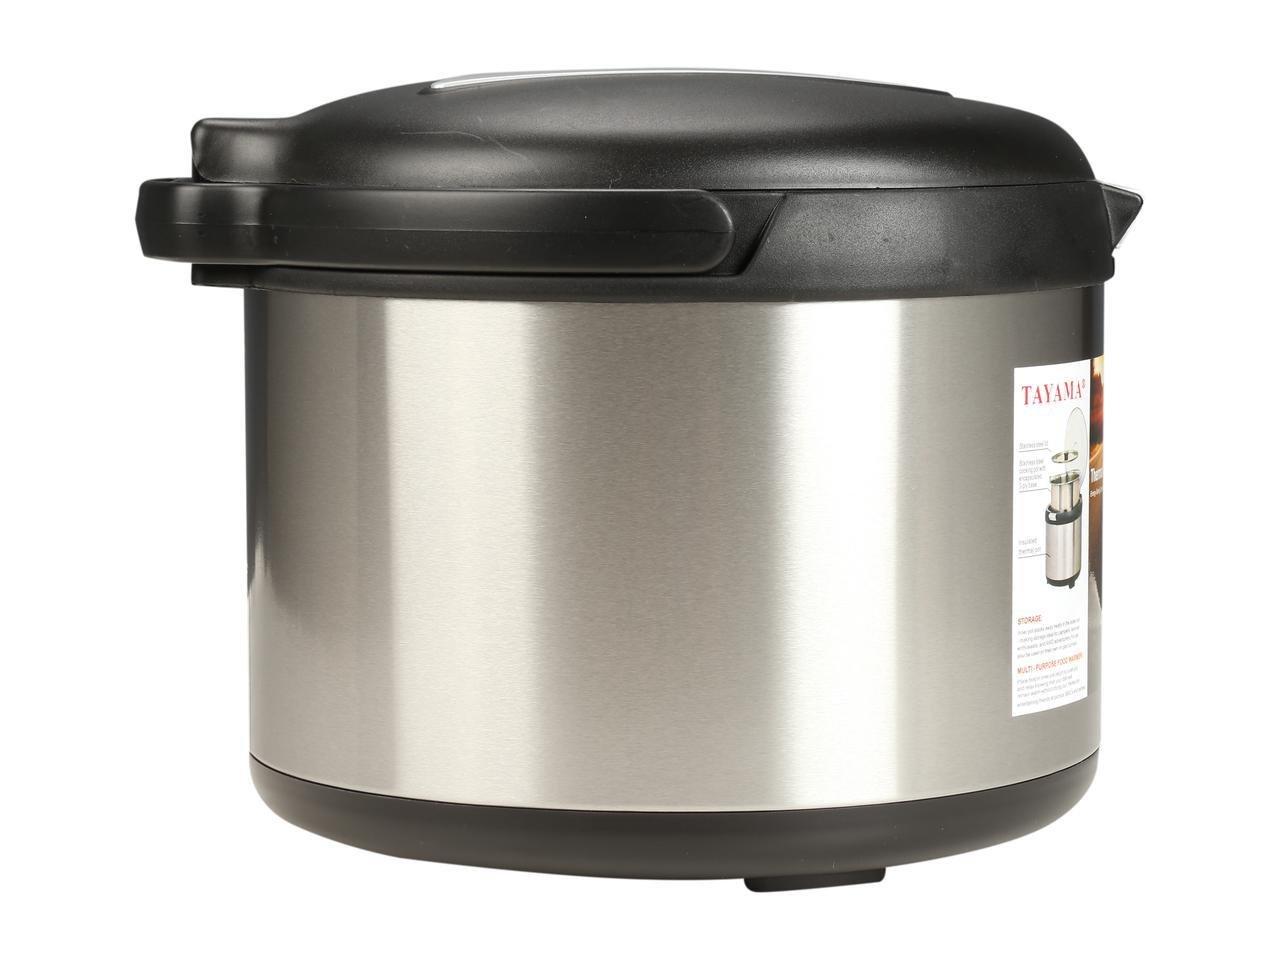 Tayama TXM-50CF Energy-Saving Thermal Cooker, 5 L, Black by TAYAMA (Image #4)